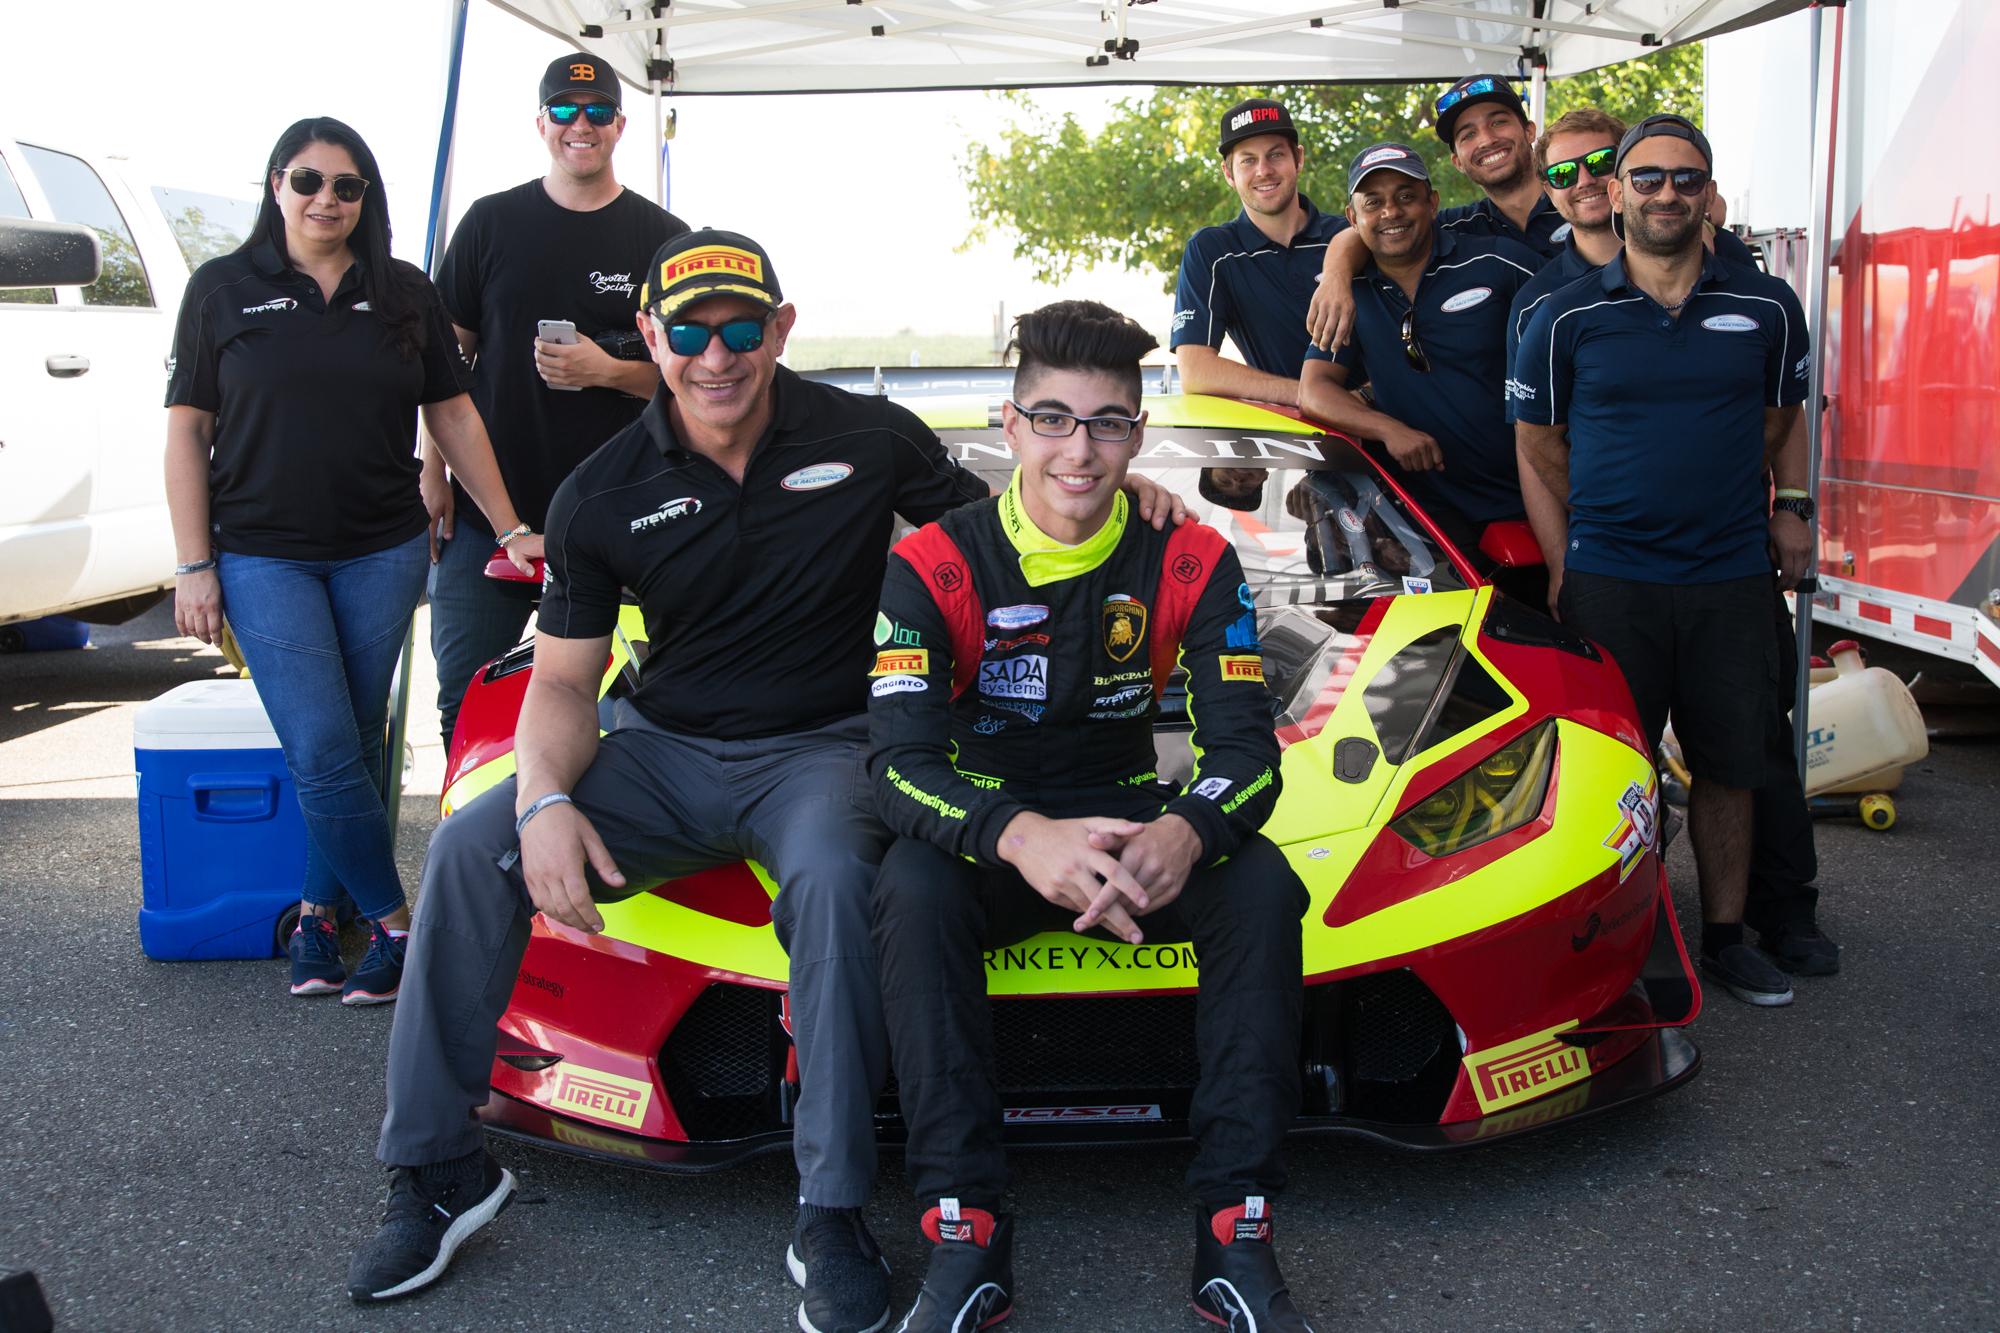 Steven-Racing-20171007-45255.jpg